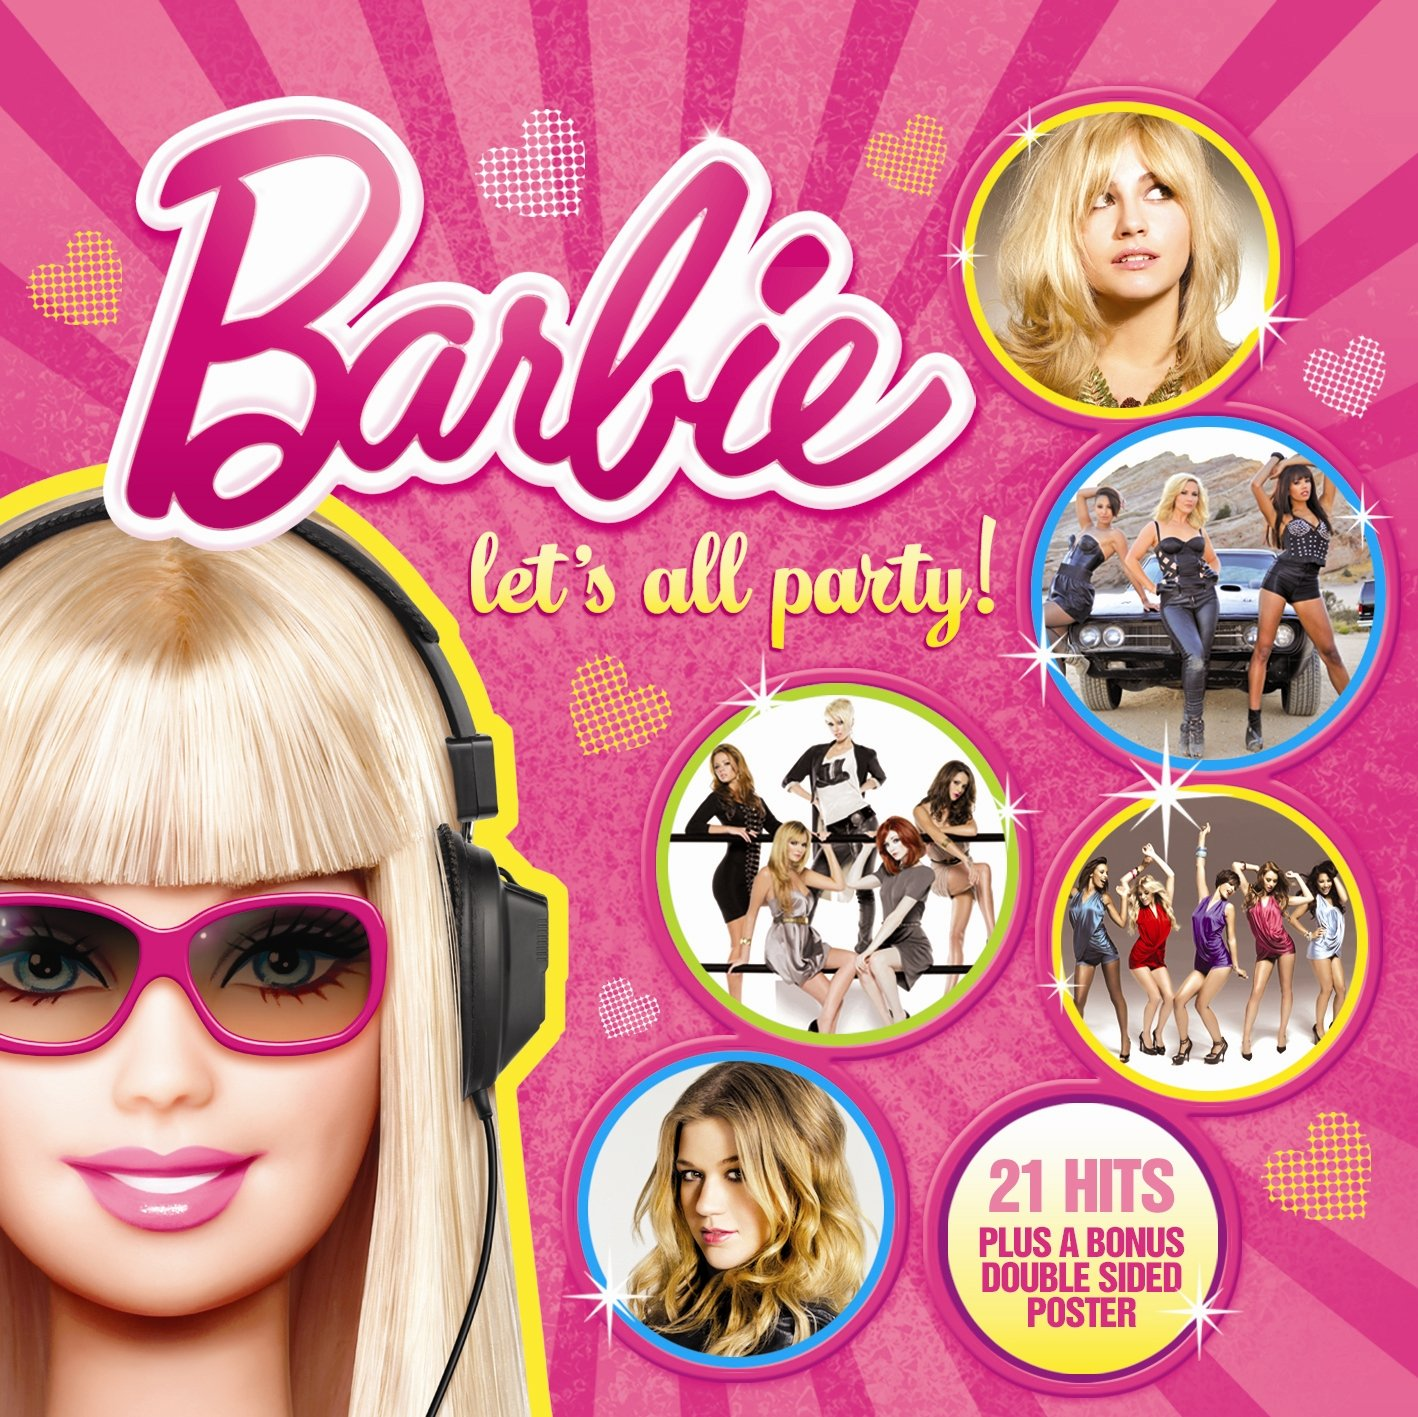 Descargar Ebooks Torrent Barbie Lets All Party! La Templanza Epub Gratis